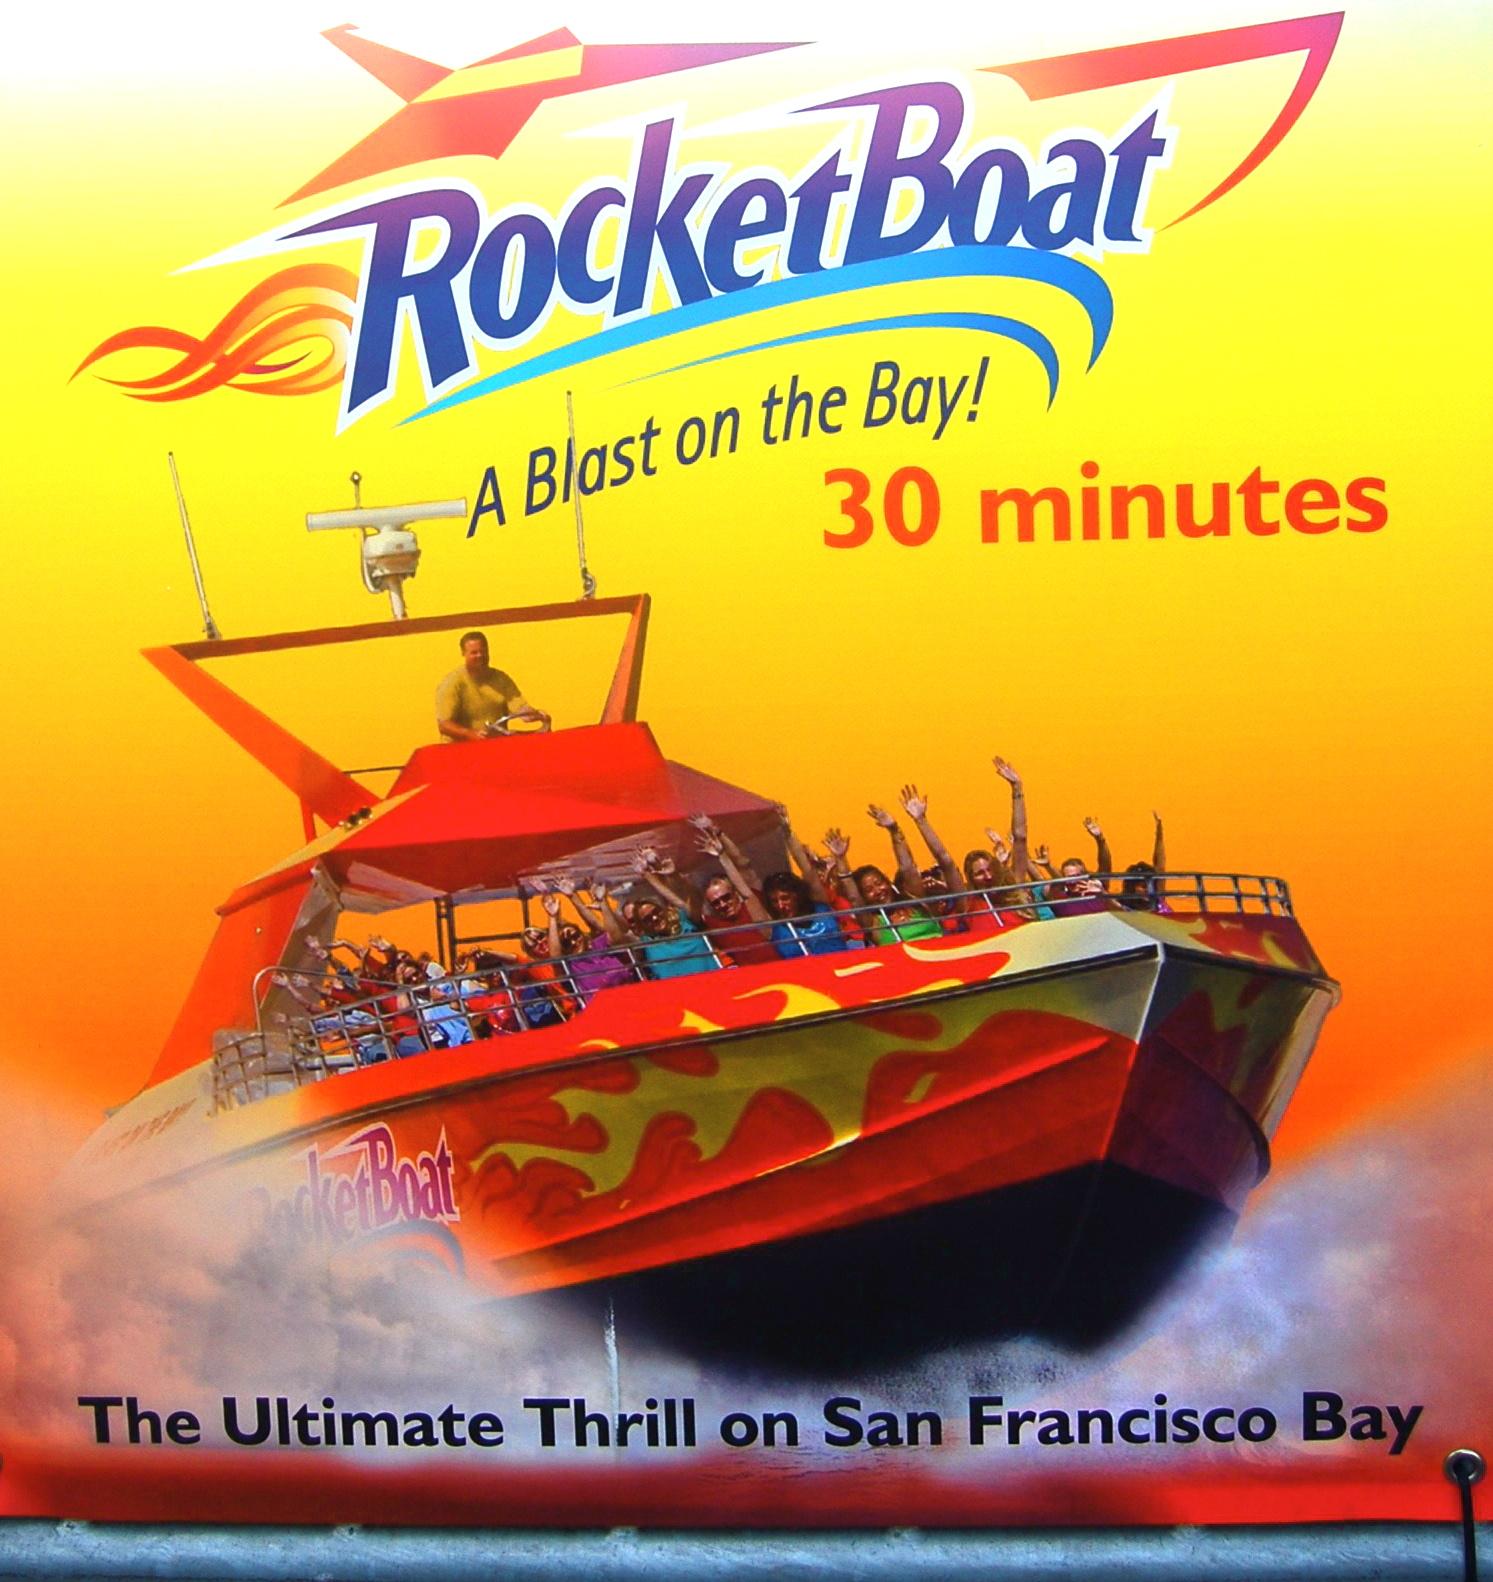 U S San Francisco Rocket Boat Winairtravel